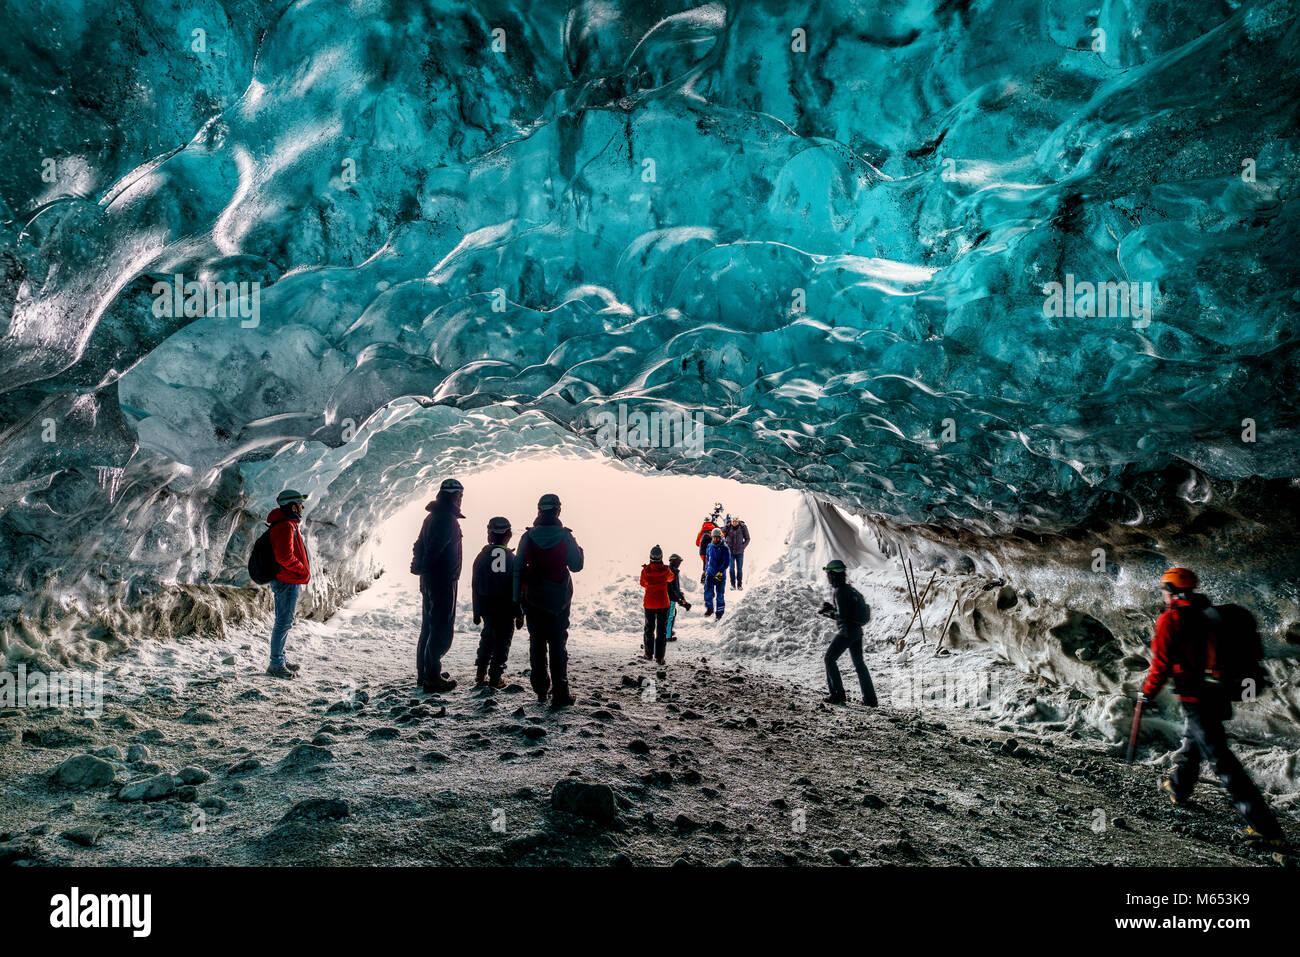 Tourists in The Crystal Cave, Breidamerkurjokull Glacier, Iceland. Emerald Blue Ice and Ash is part of Breidamerkurjokull. - Stock Image